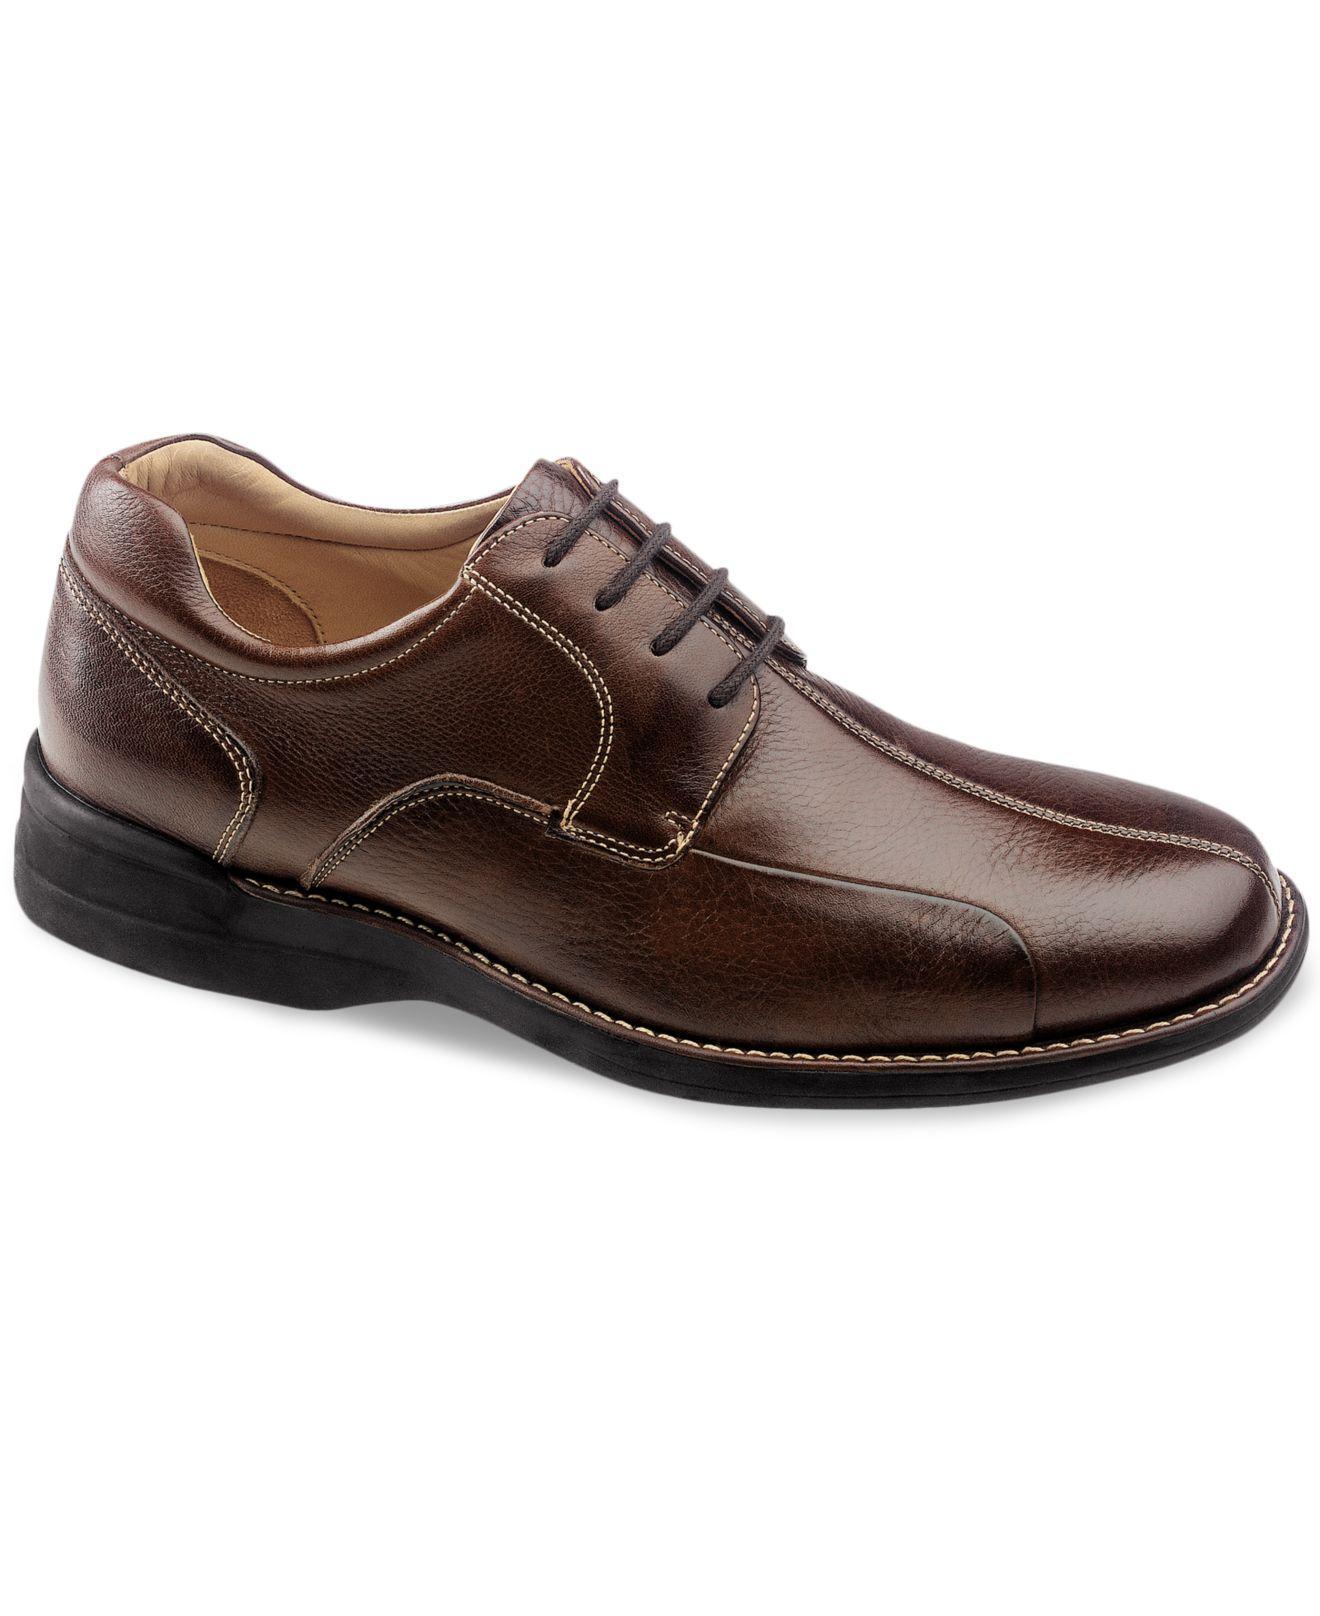 Airport Friendly Dress Shoes